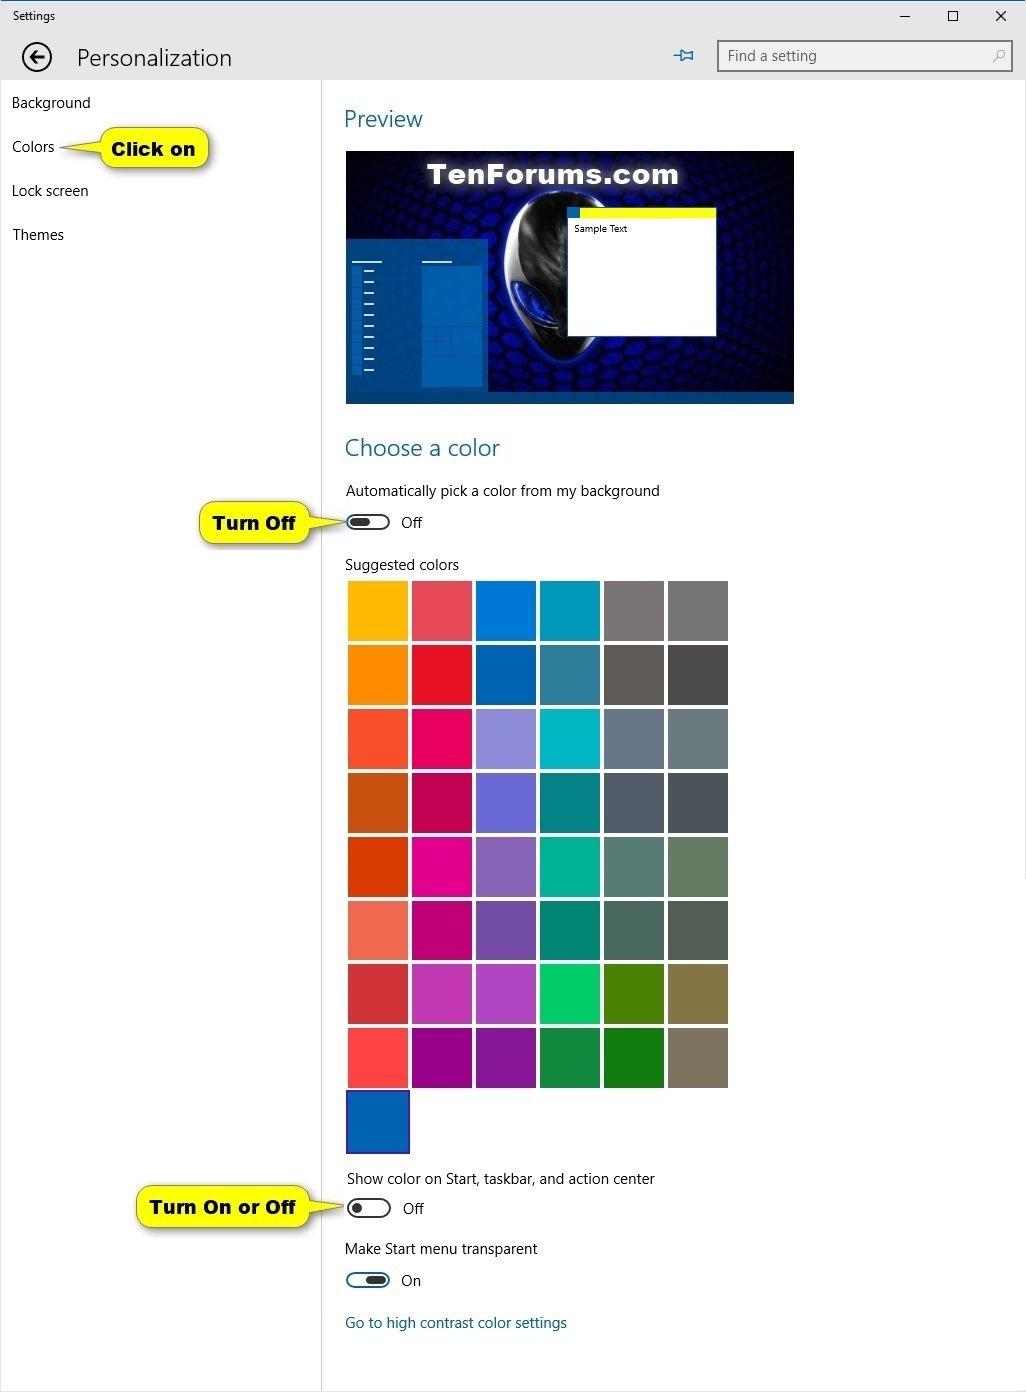 Aerolite Theme - Install in Windows 10 - Windows 10 Tutorials